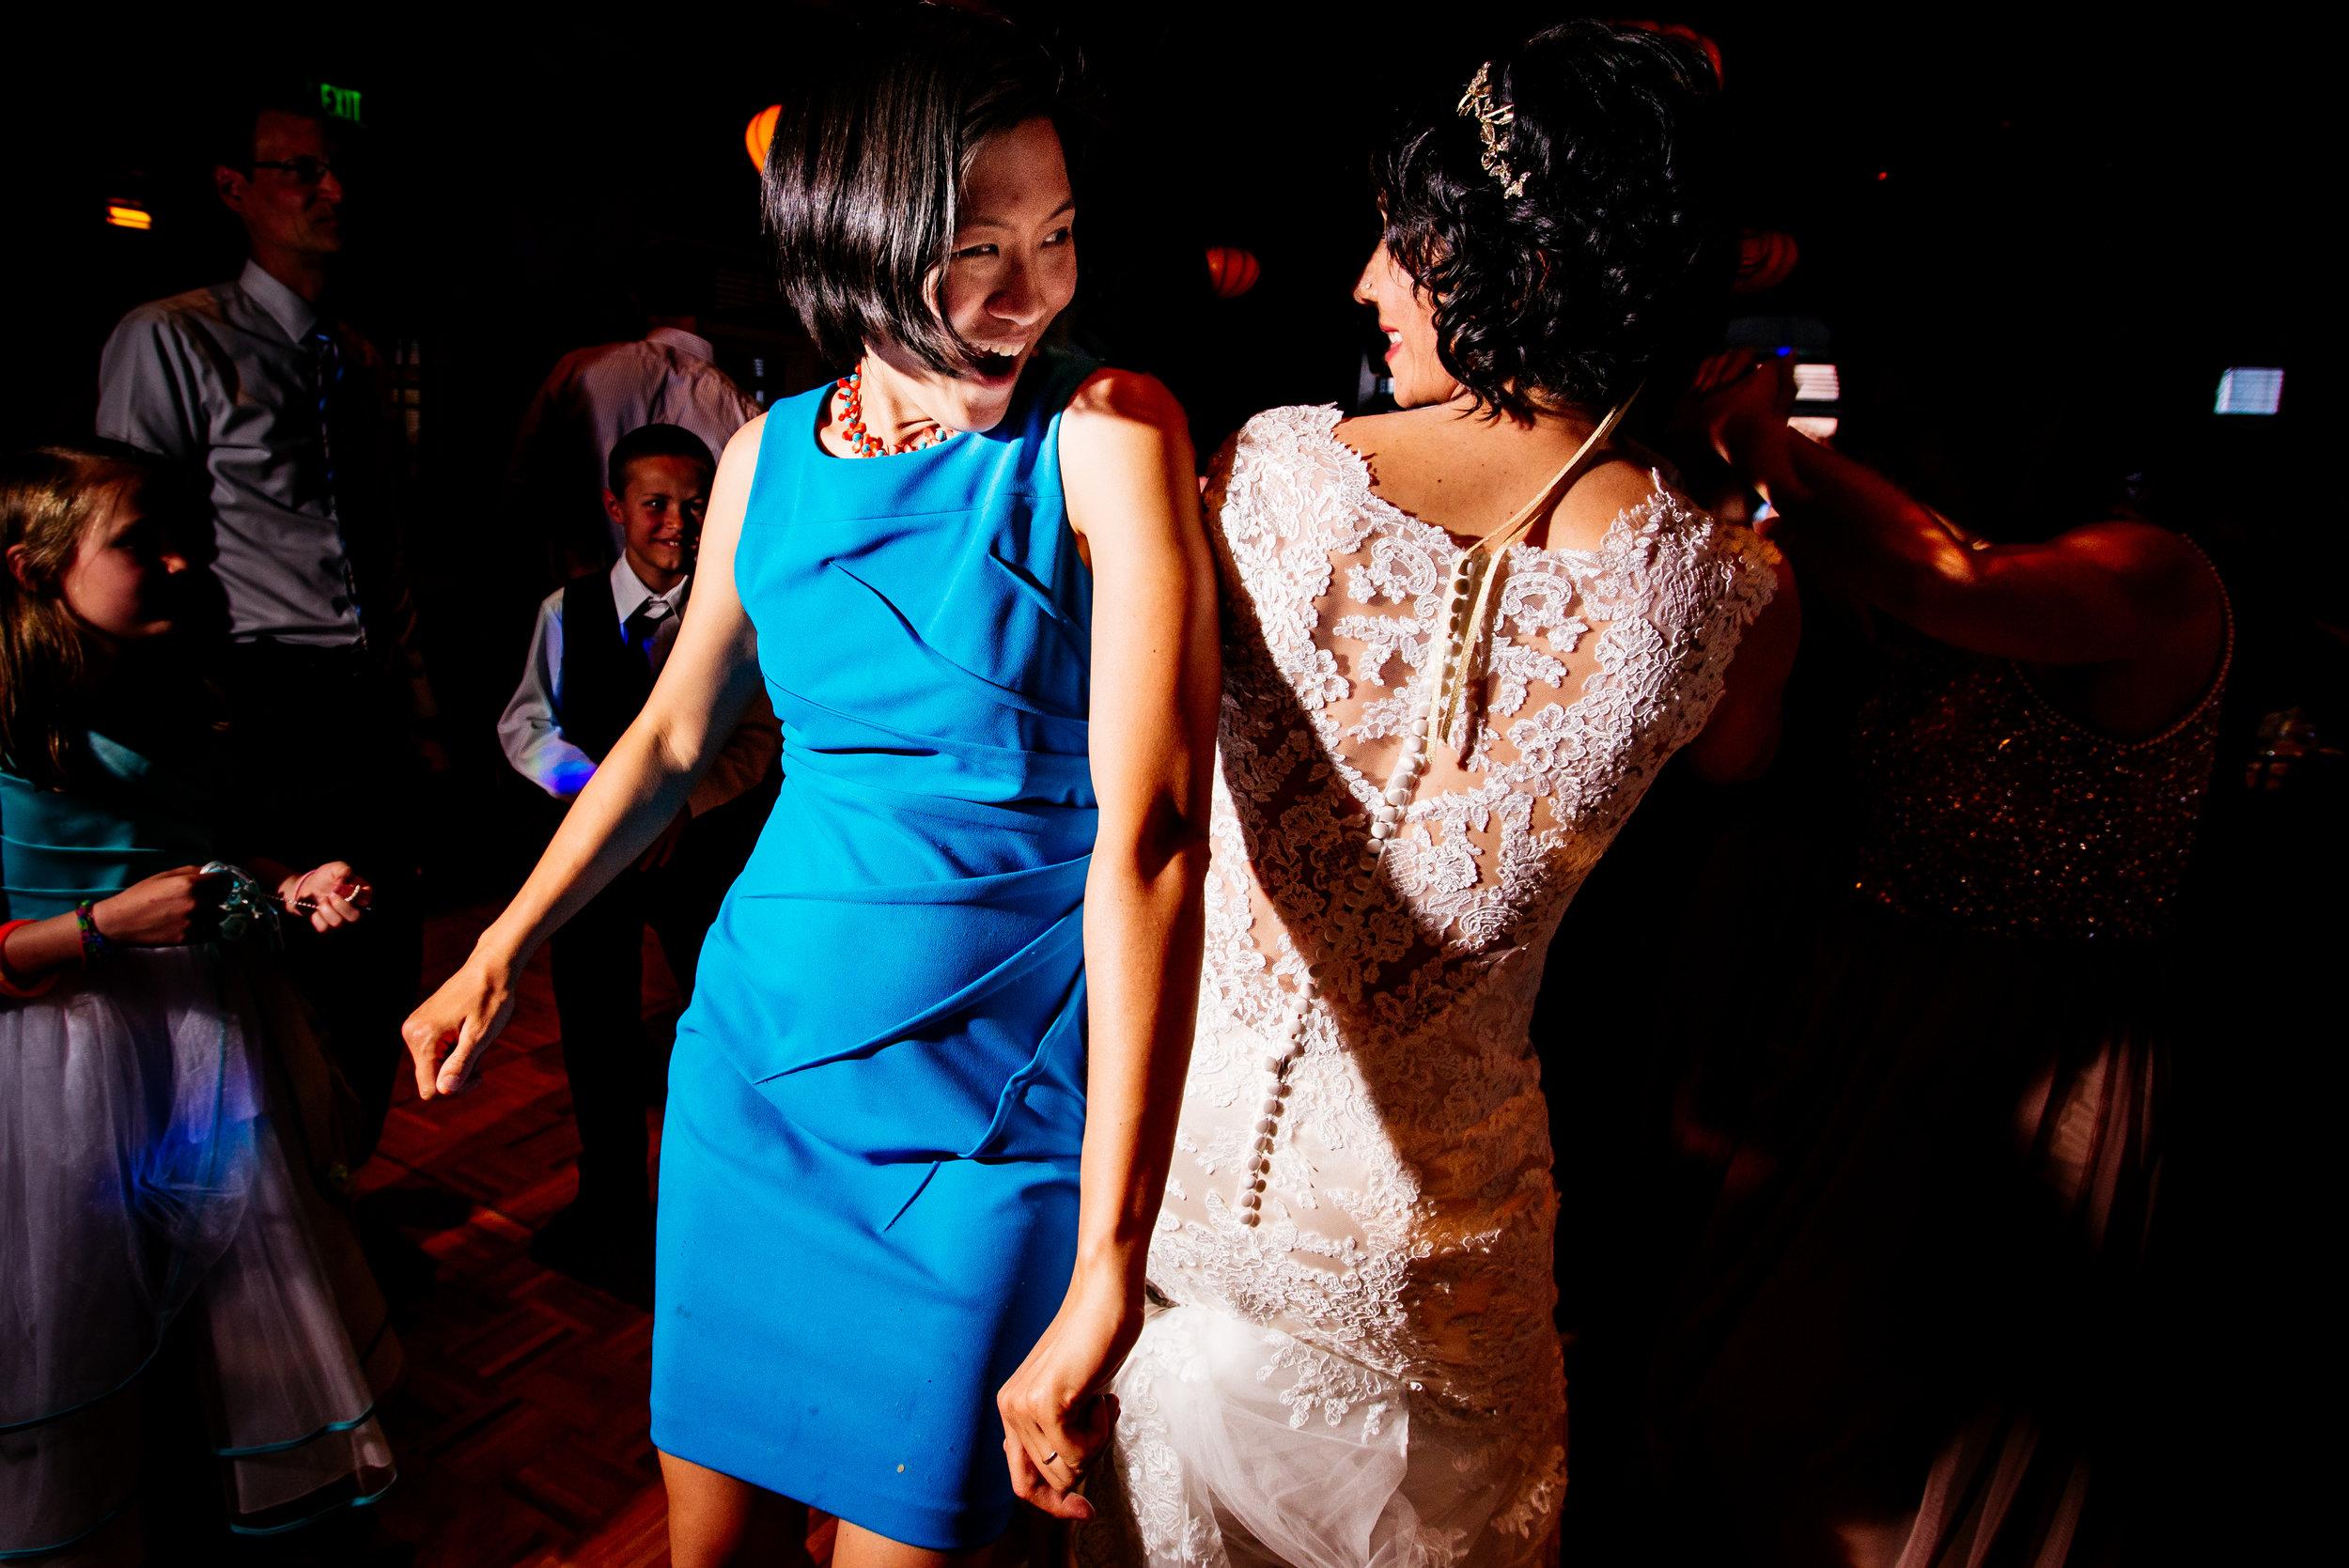 Extended_Play_Photography_Carmella_Wedding-20.jpg